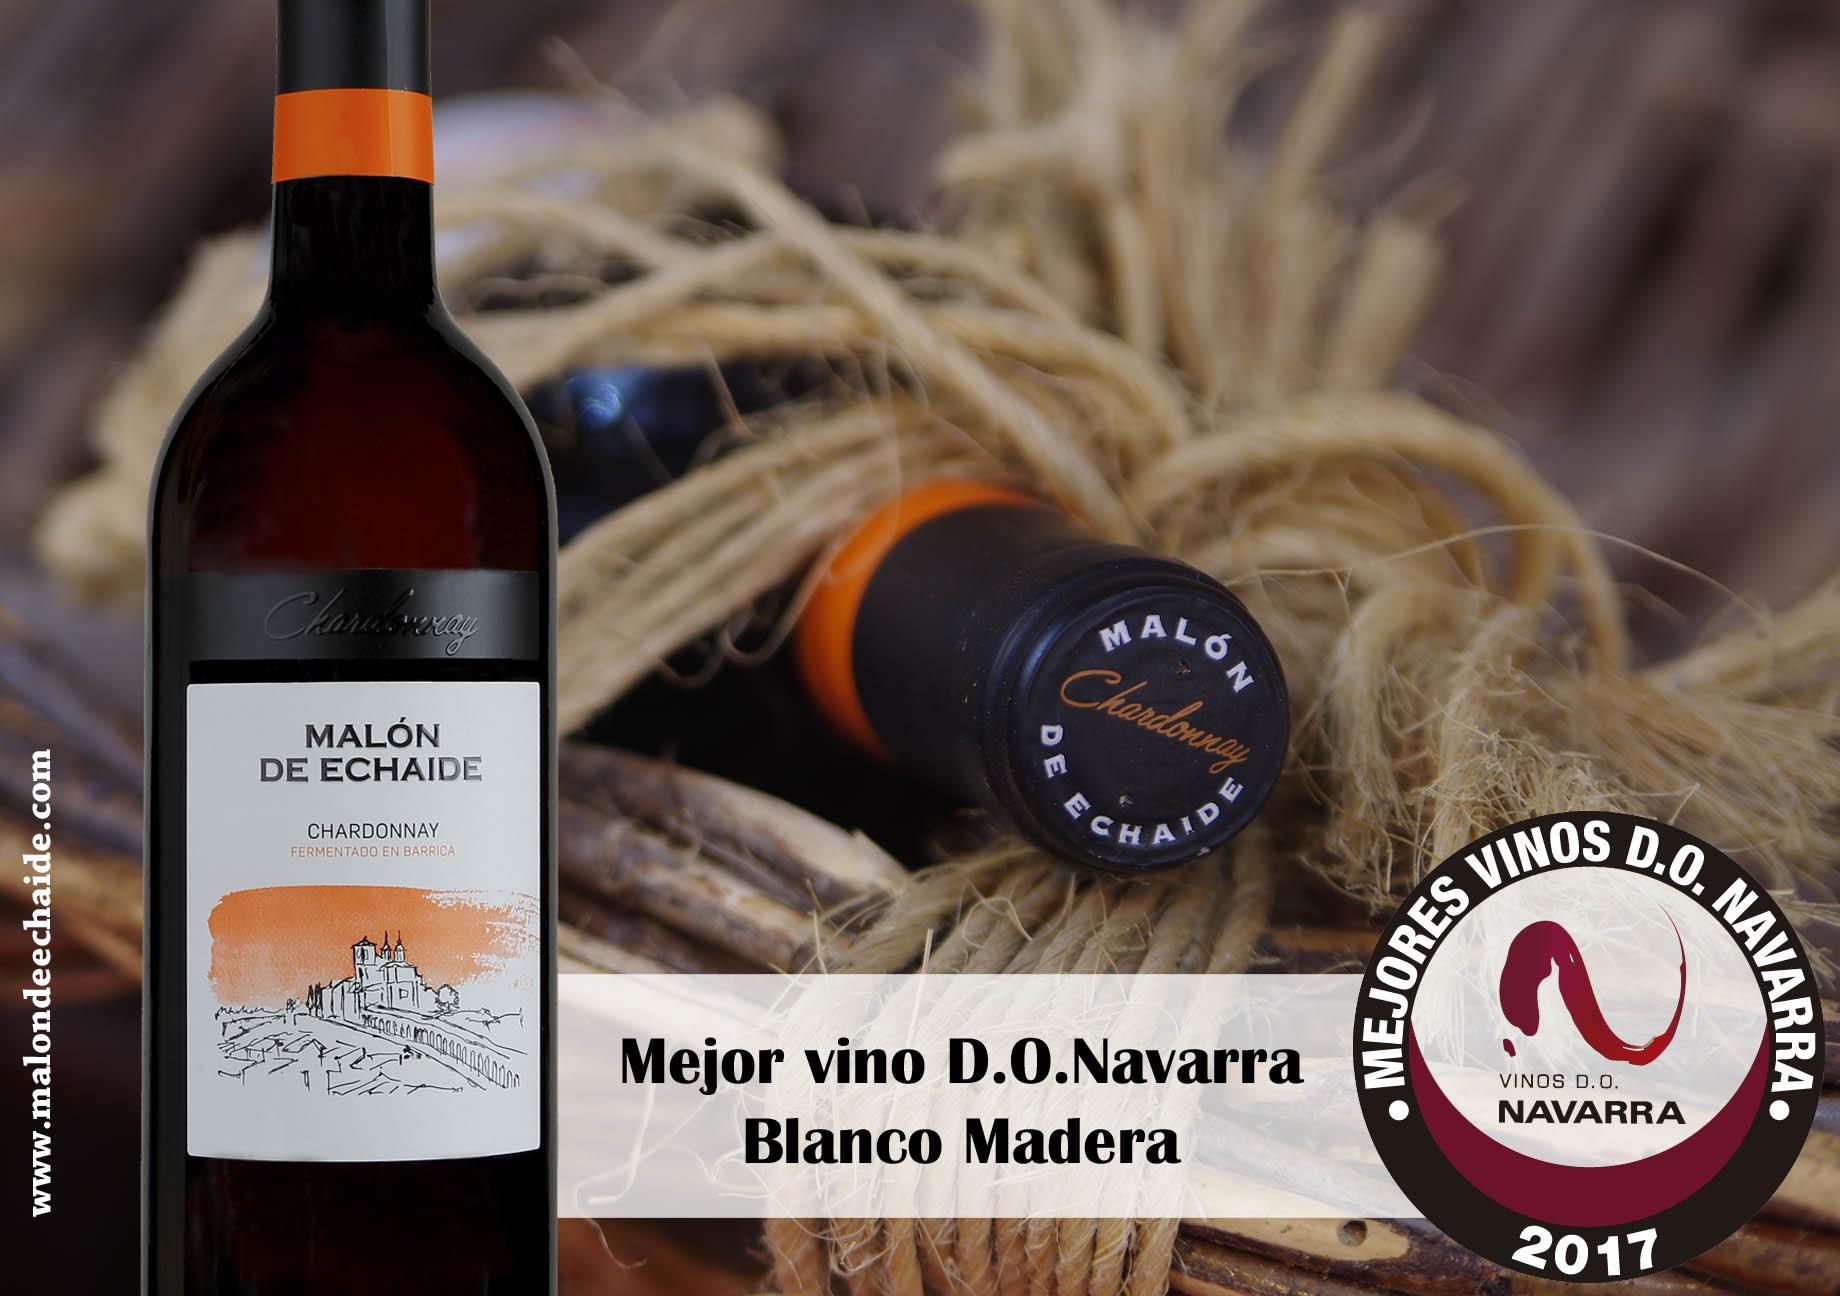 Mejor vino blanco madera do navarra